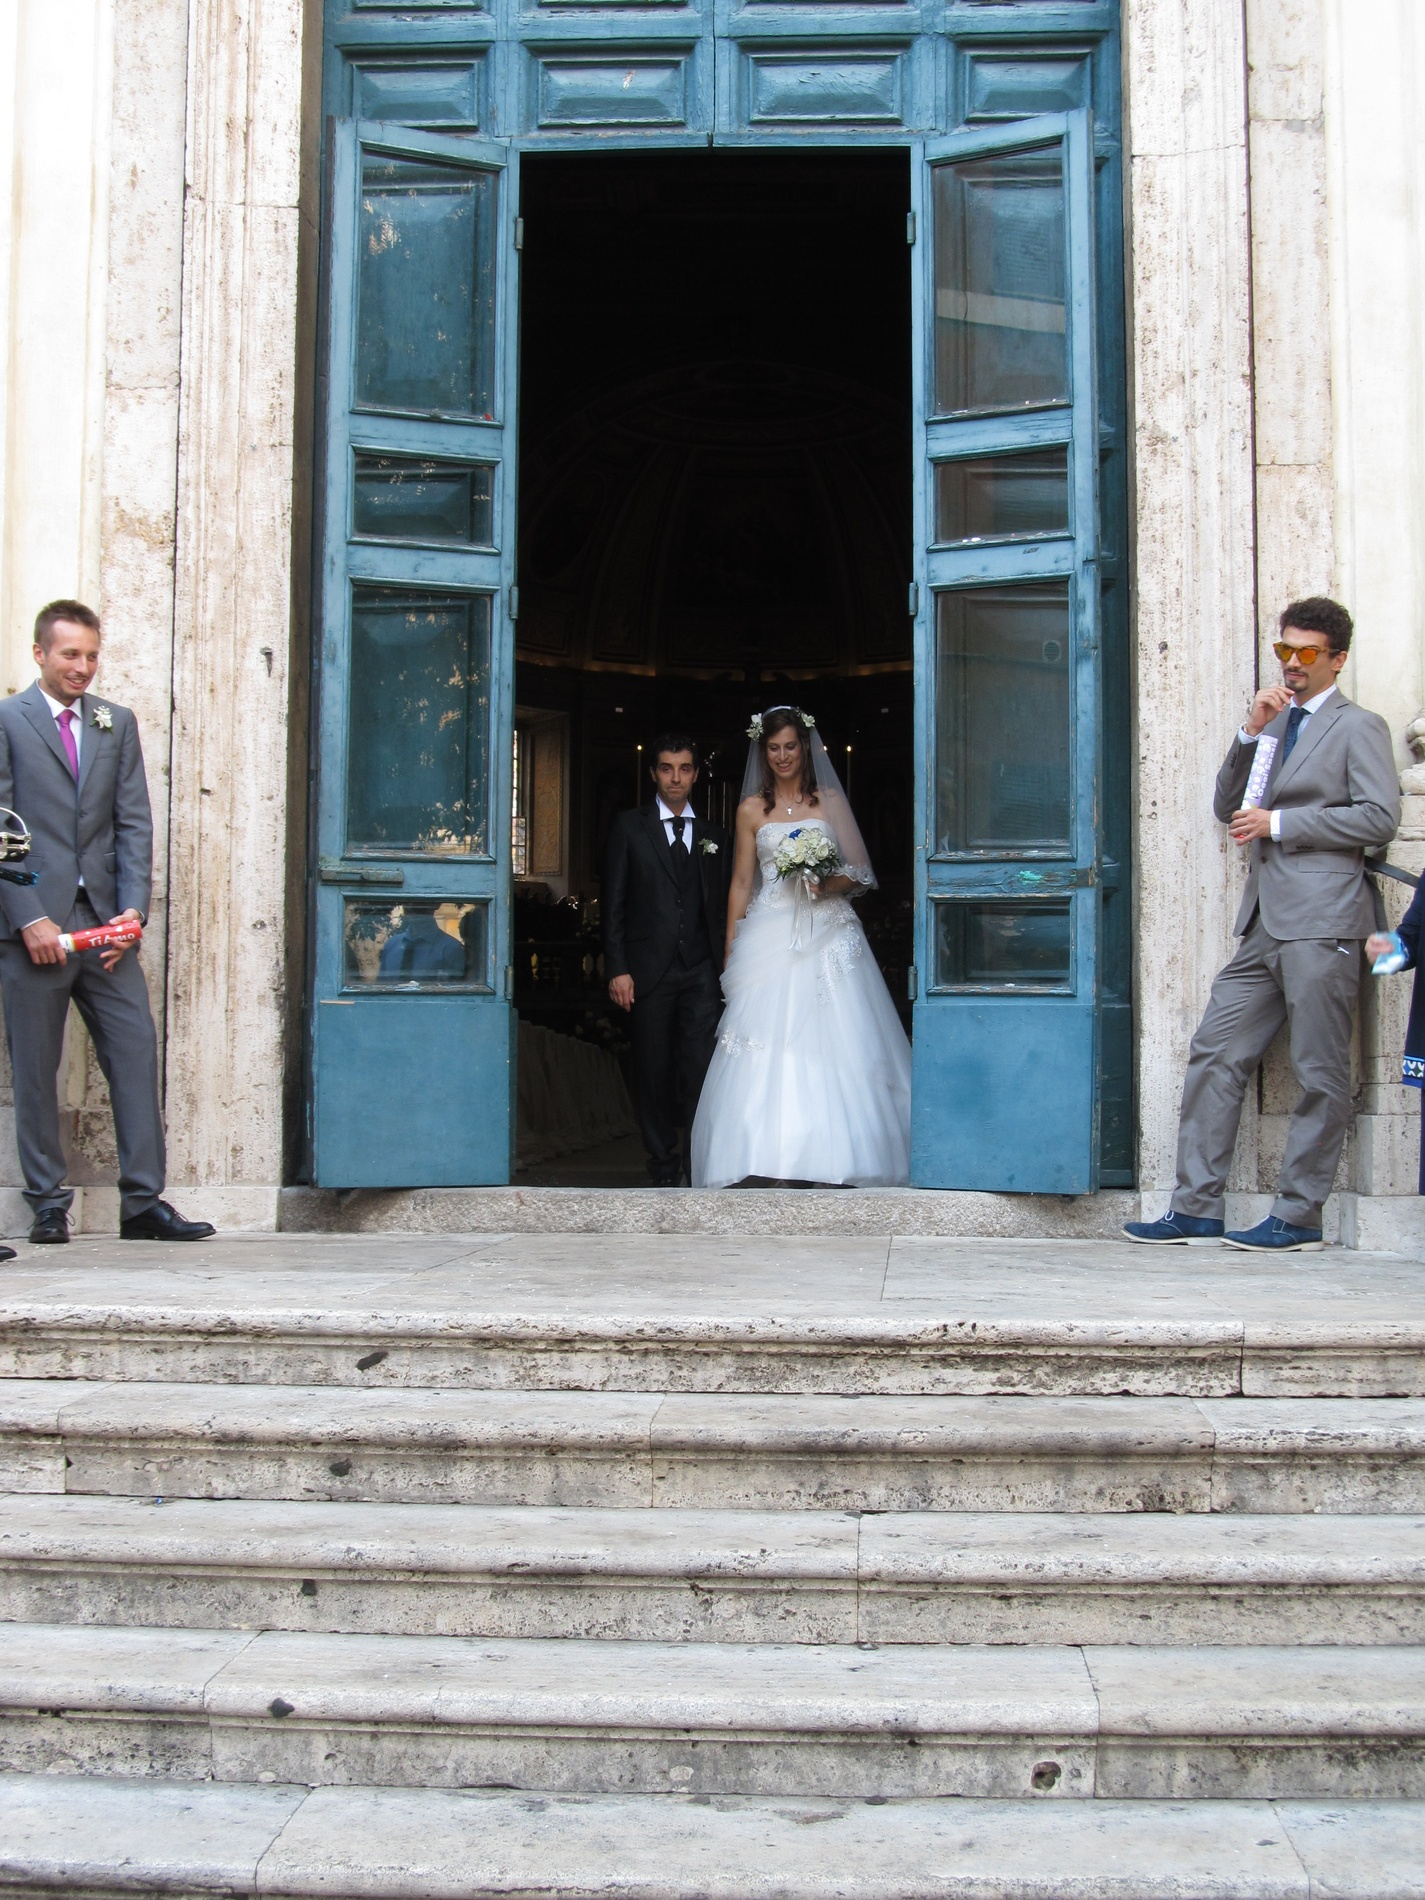 matrimonio-ilaria-torrisi-e-marco-di-lucia-2015-08-08-16-52-23